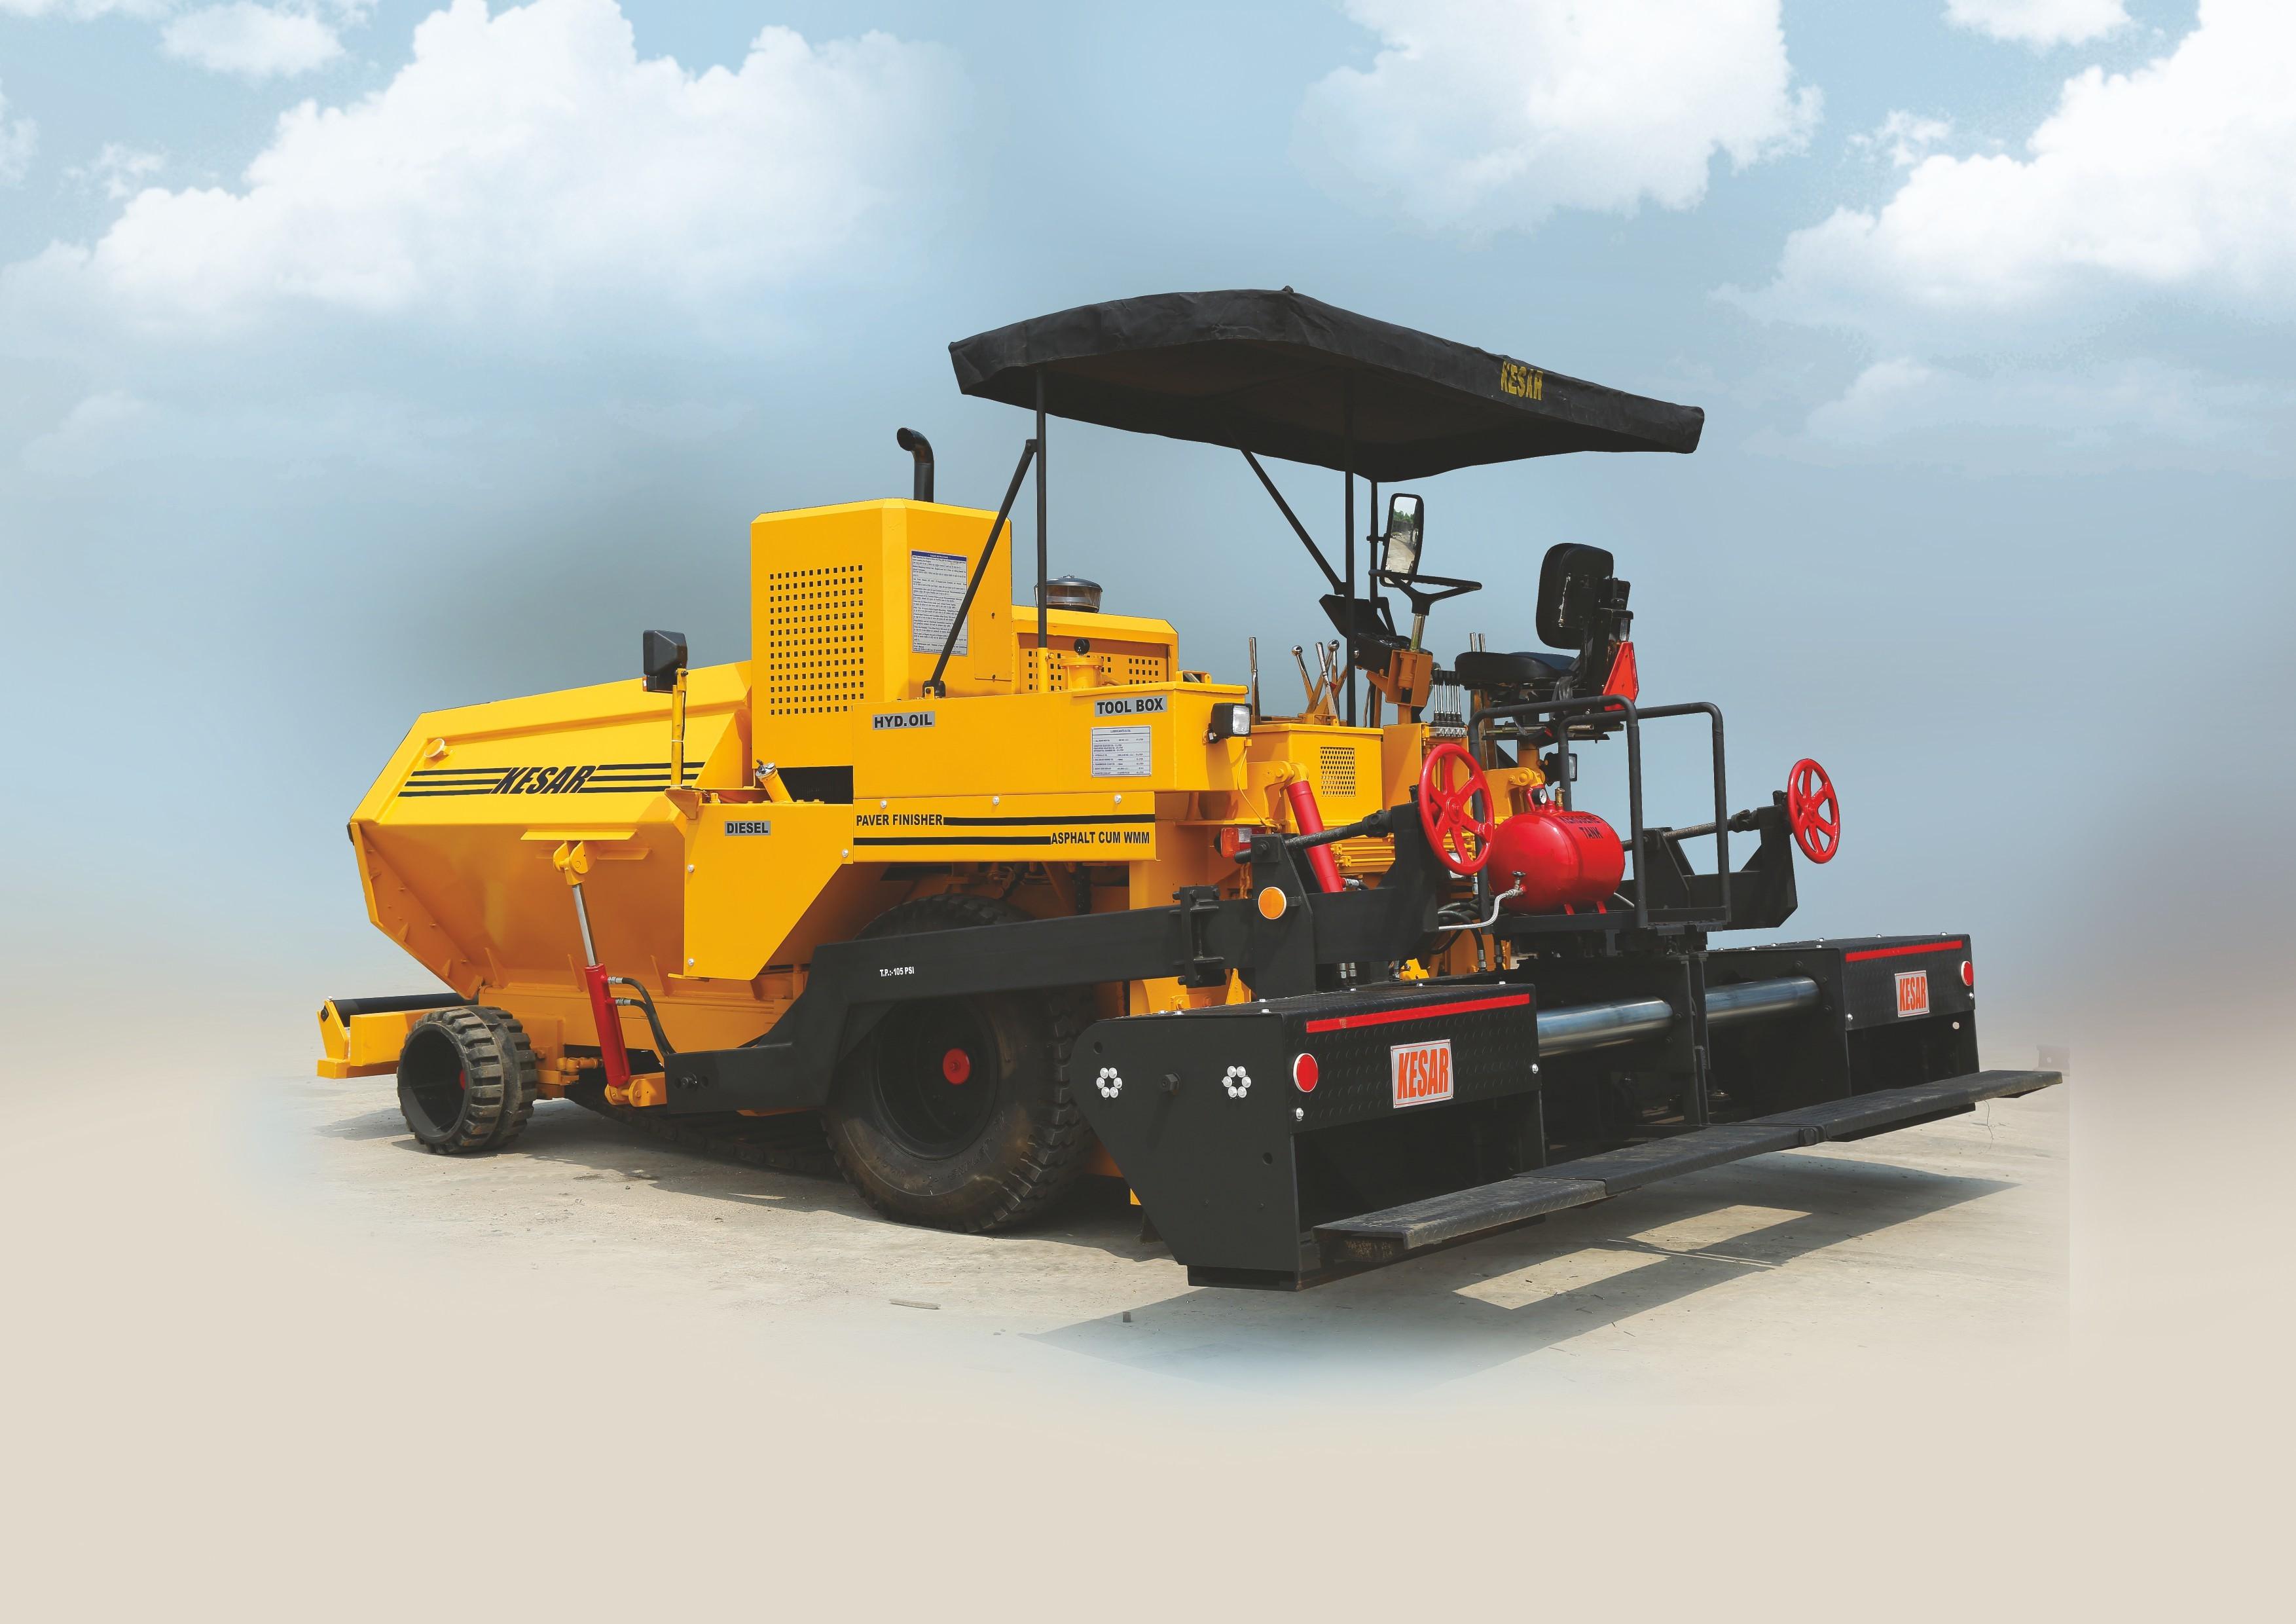 Mechanical Road Paver